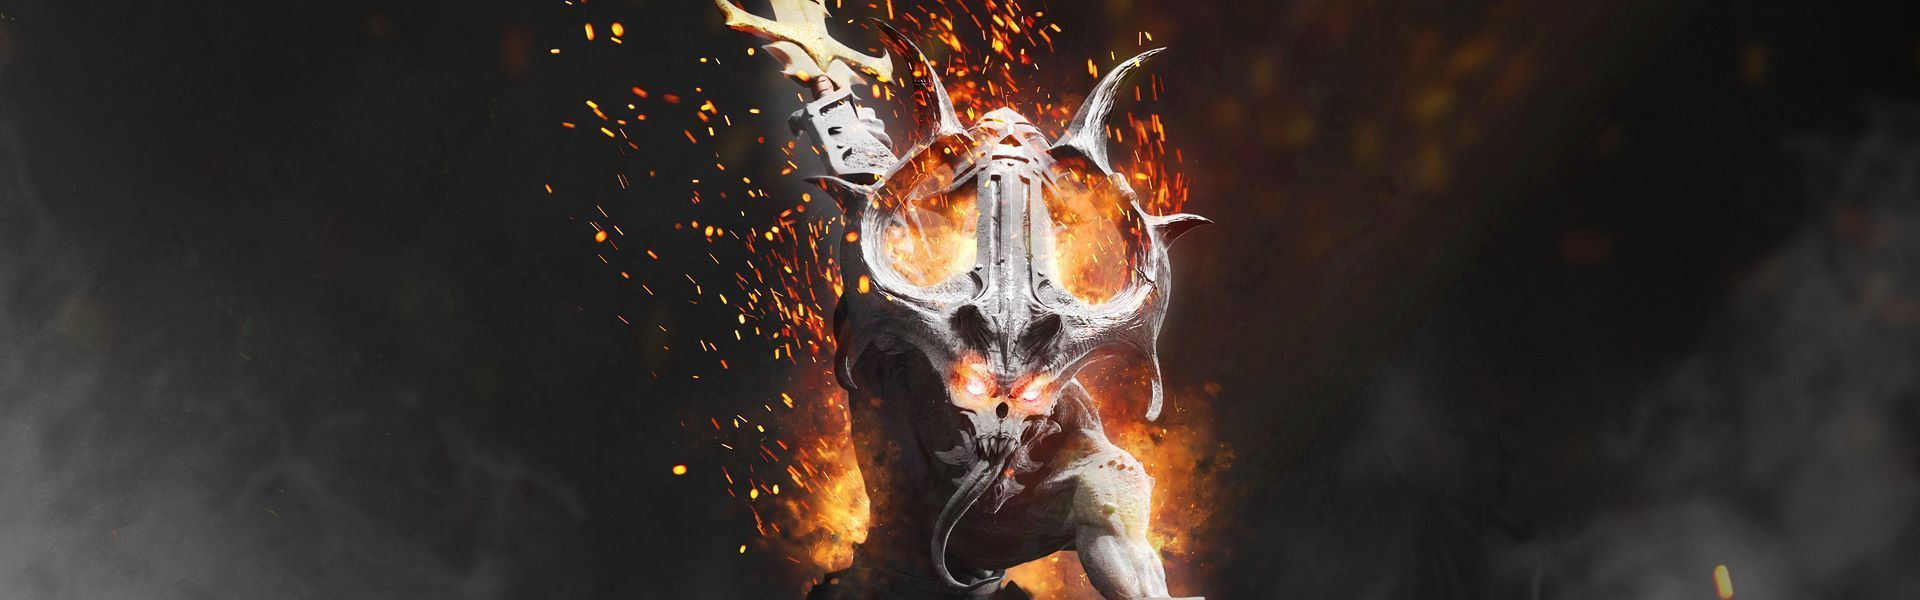 Warhammer: Chaosbane - XP Boost (DLC) Steam Key GLOBAL